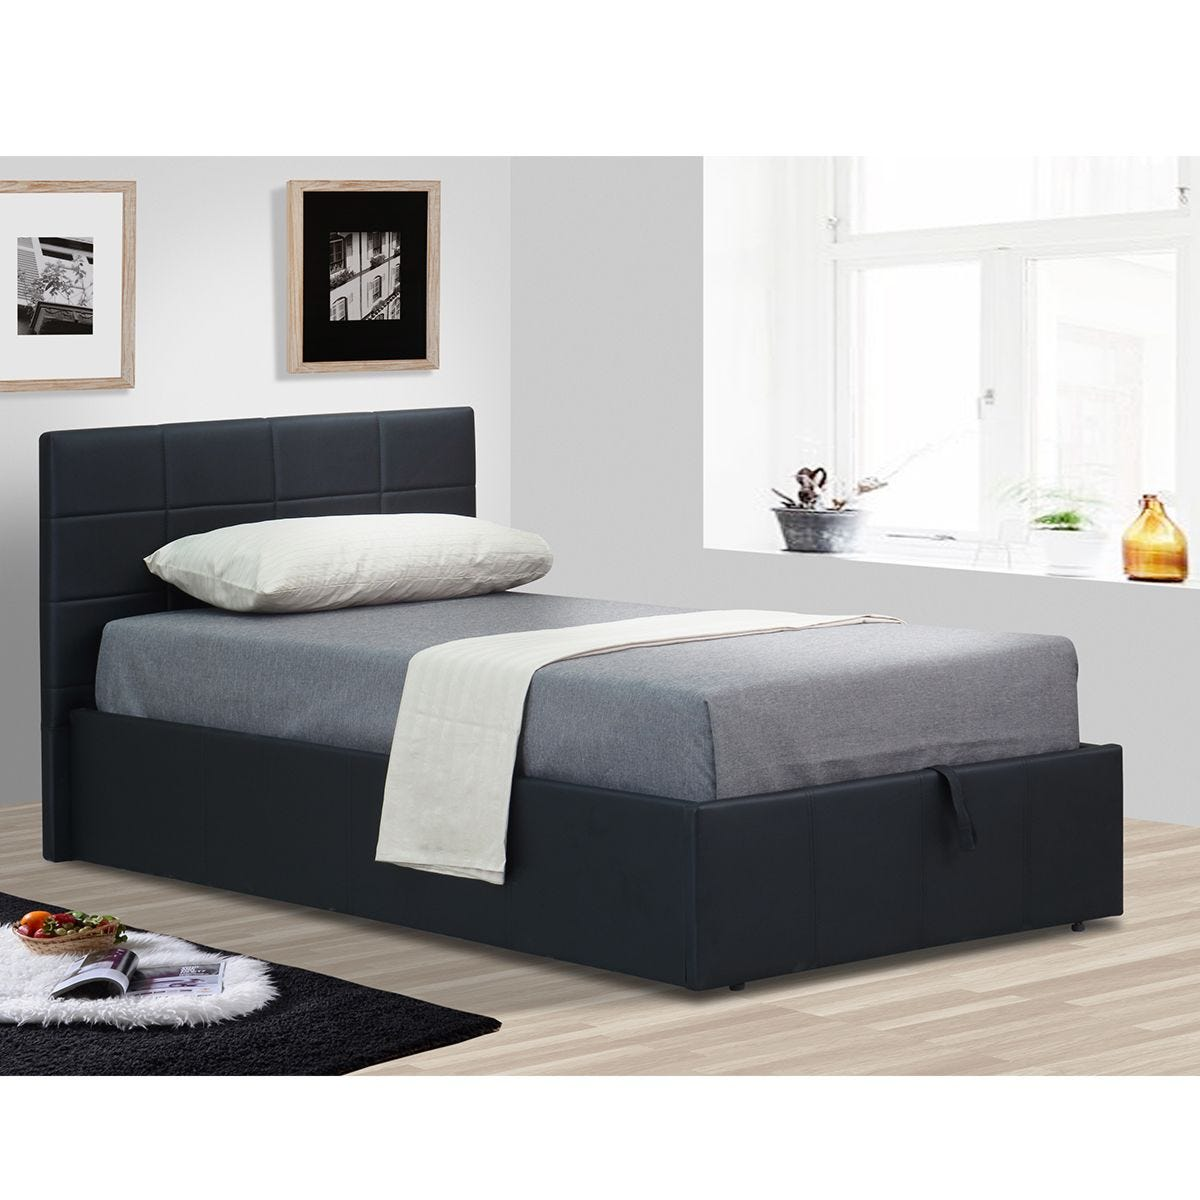 Ezra Ottoman Storage Bed - Black